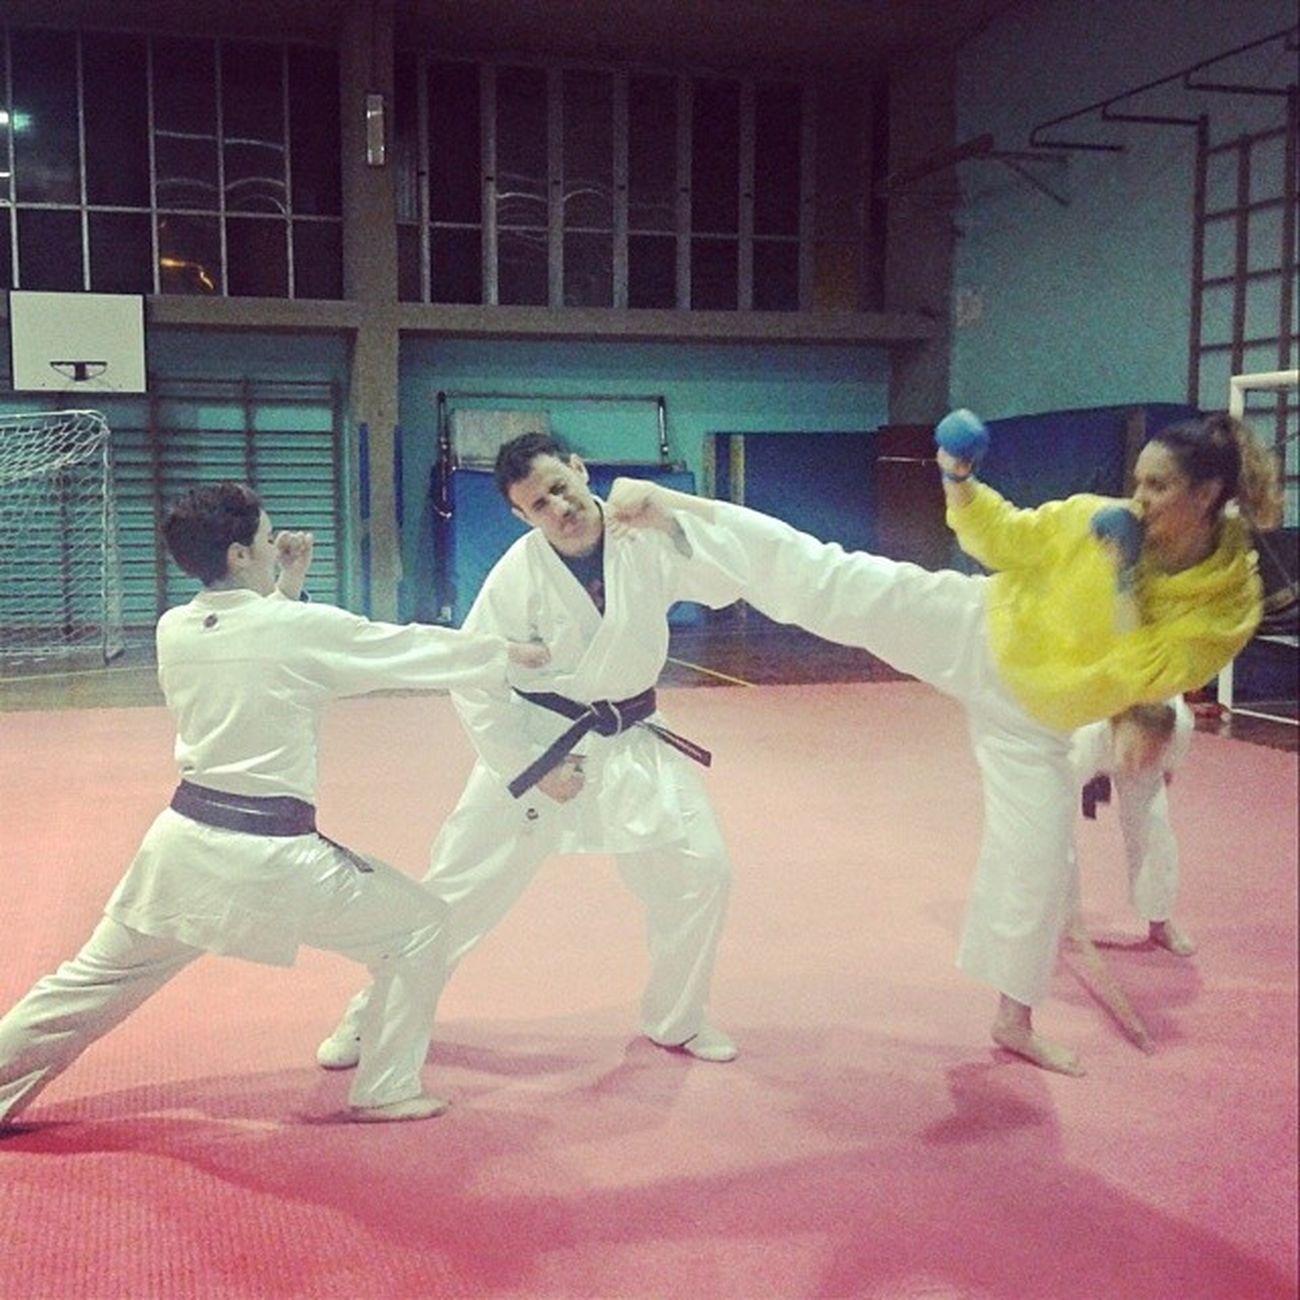 Allenamento Training Valentineday Mawashi yakuzukifijlkamwkfgiannozzinelcuorecomparinitiamosietefantasricikaratekikcazzottodolentechiavapaolockscertaldosiamobellissimimlmlnonsimollauncazzobomber